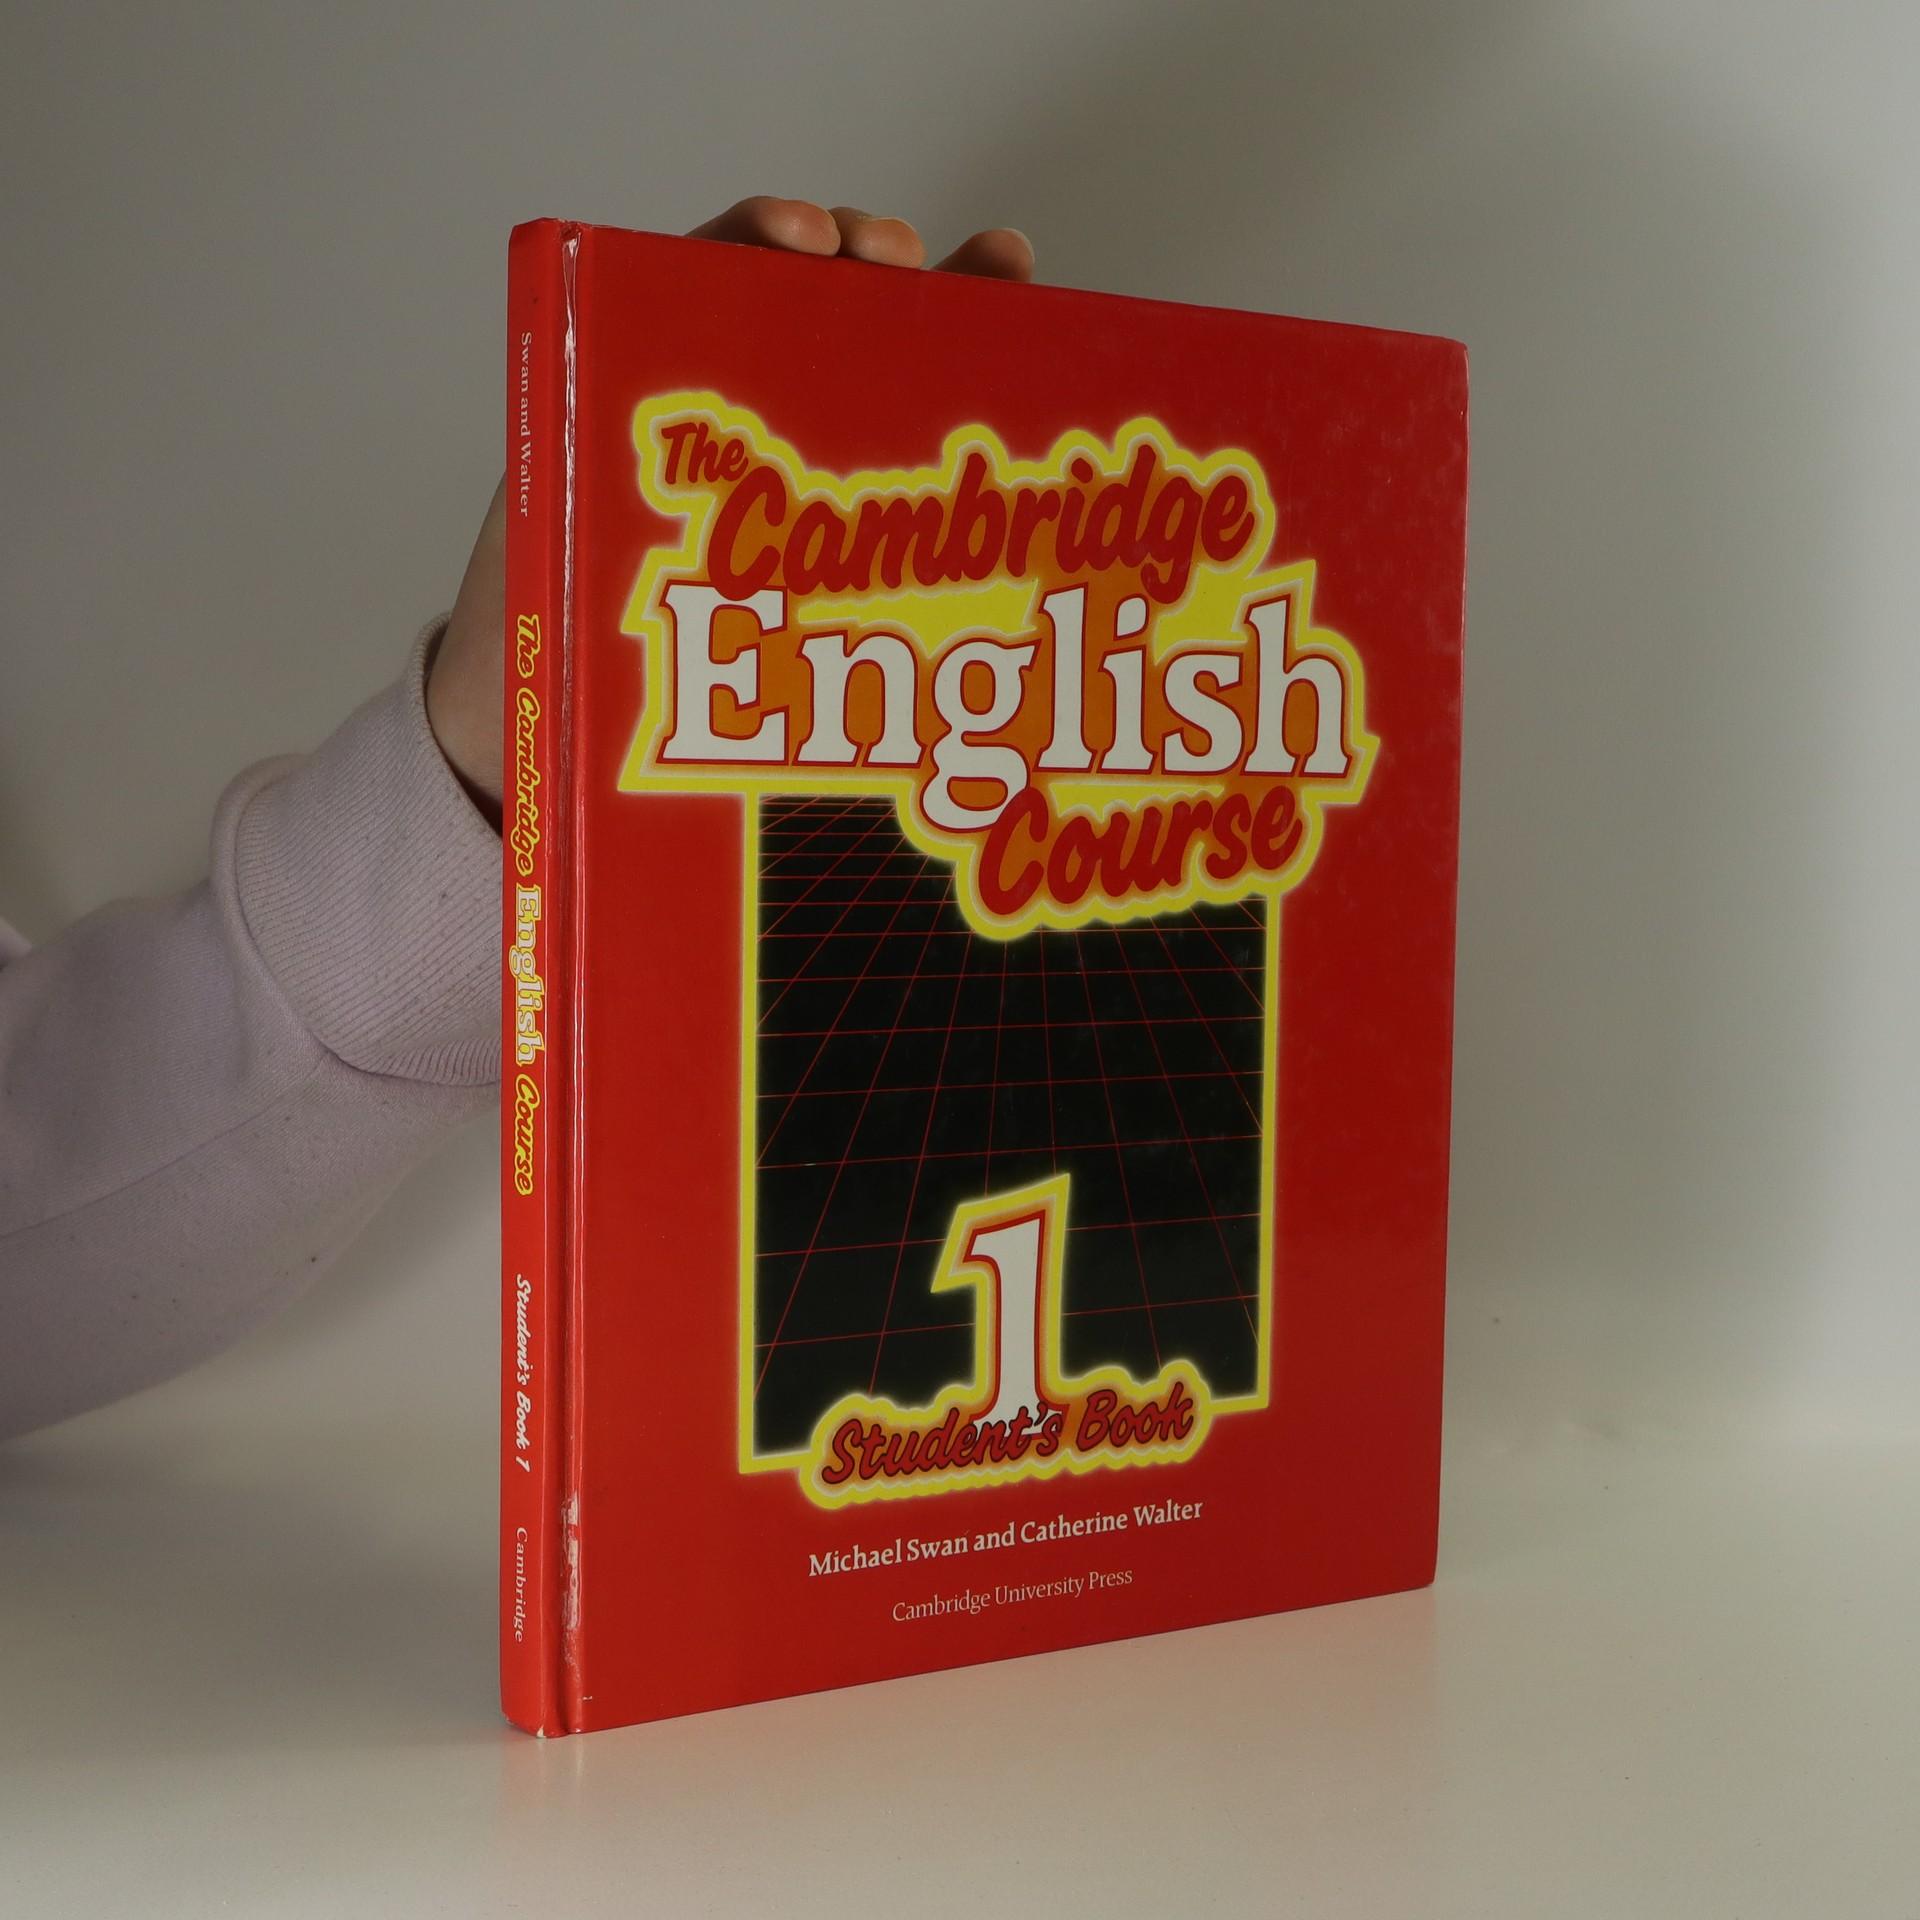 antikvární kniha The Cambridge English Course. Student's Book 1, 1991